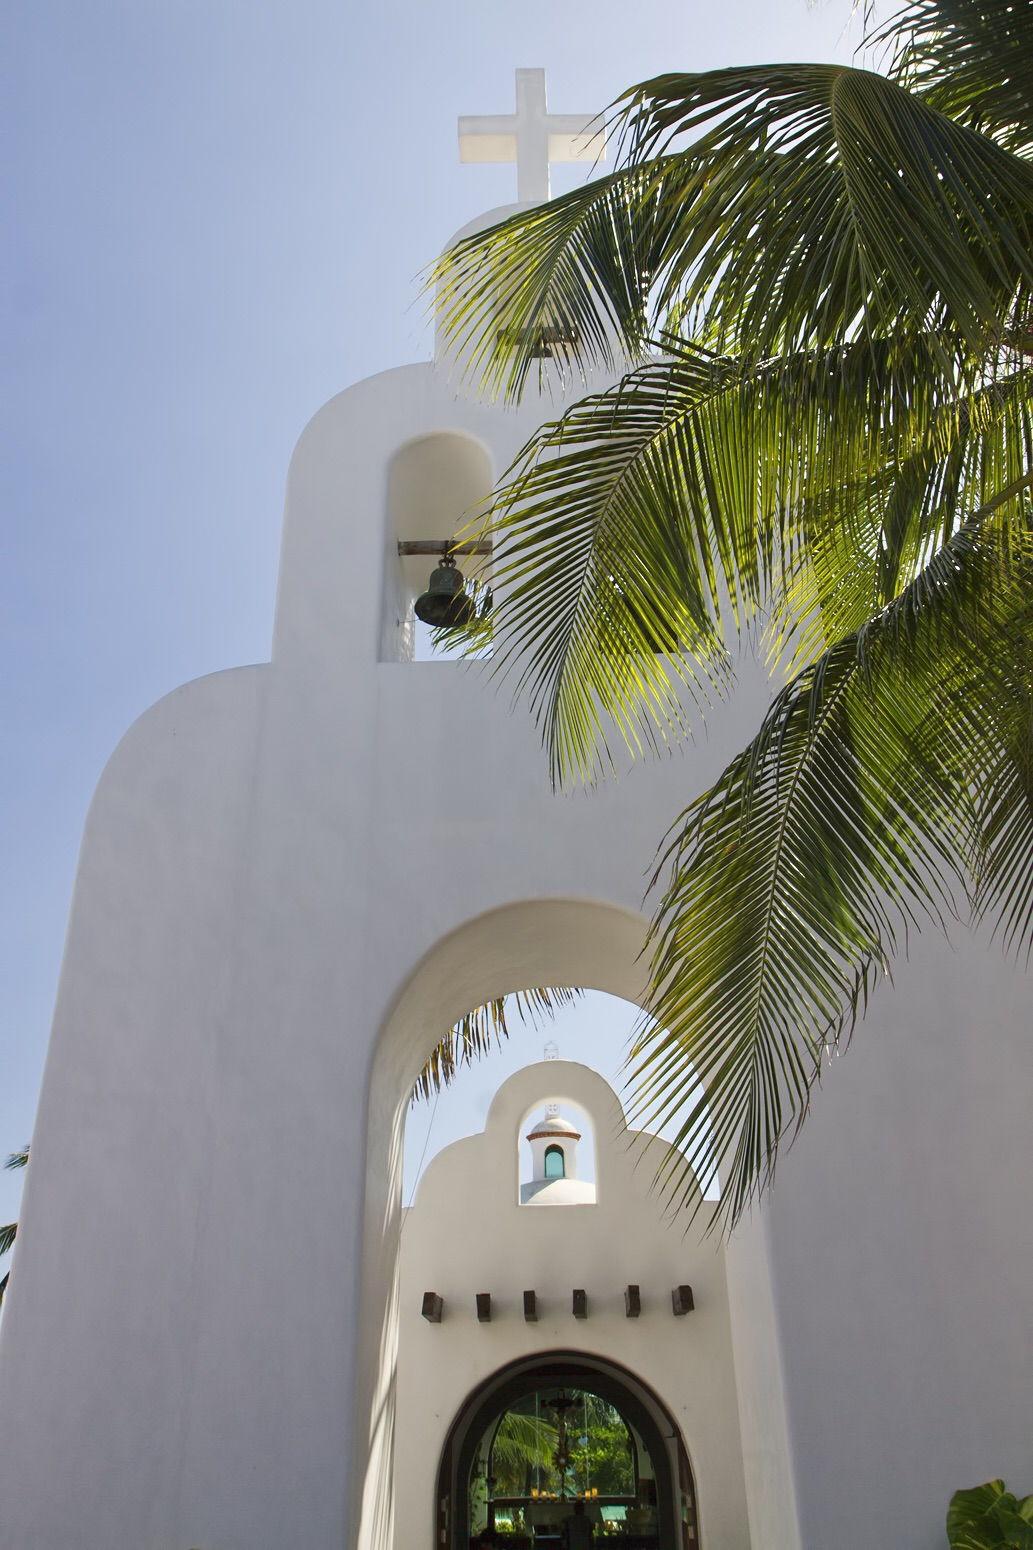 Iglesia de la playa del Carmen